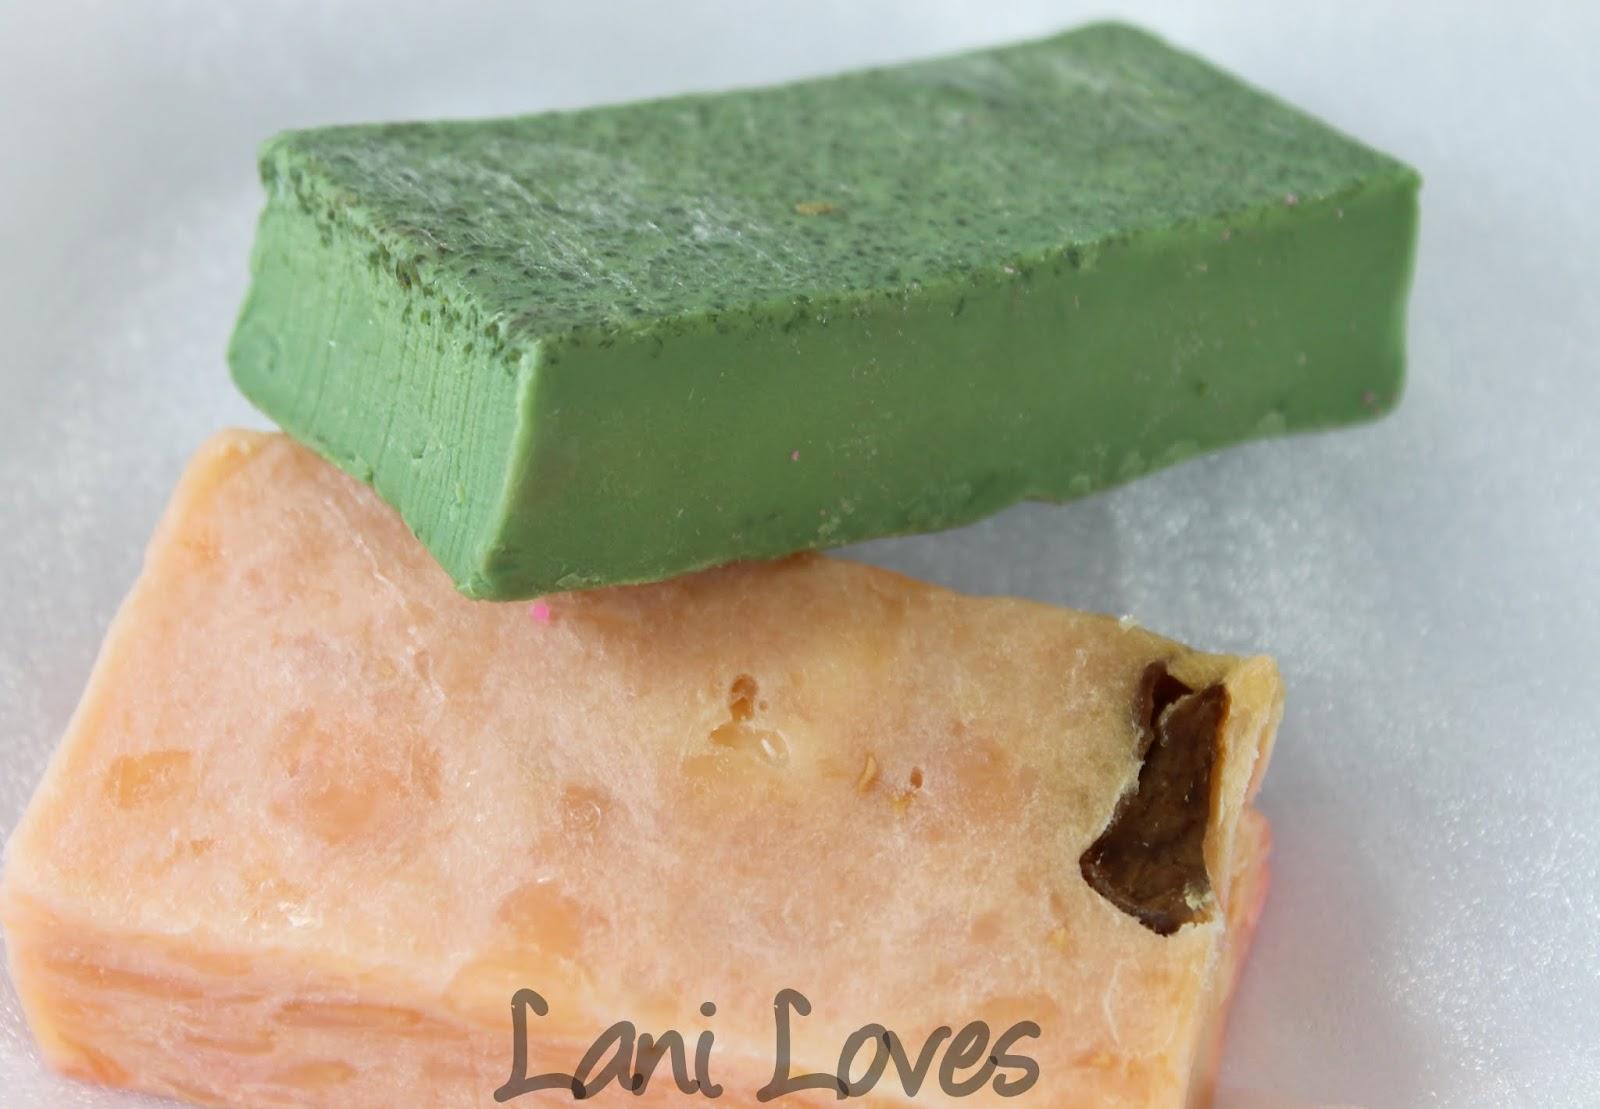 LUSH Parsley Porridge and Mangnificent soaps